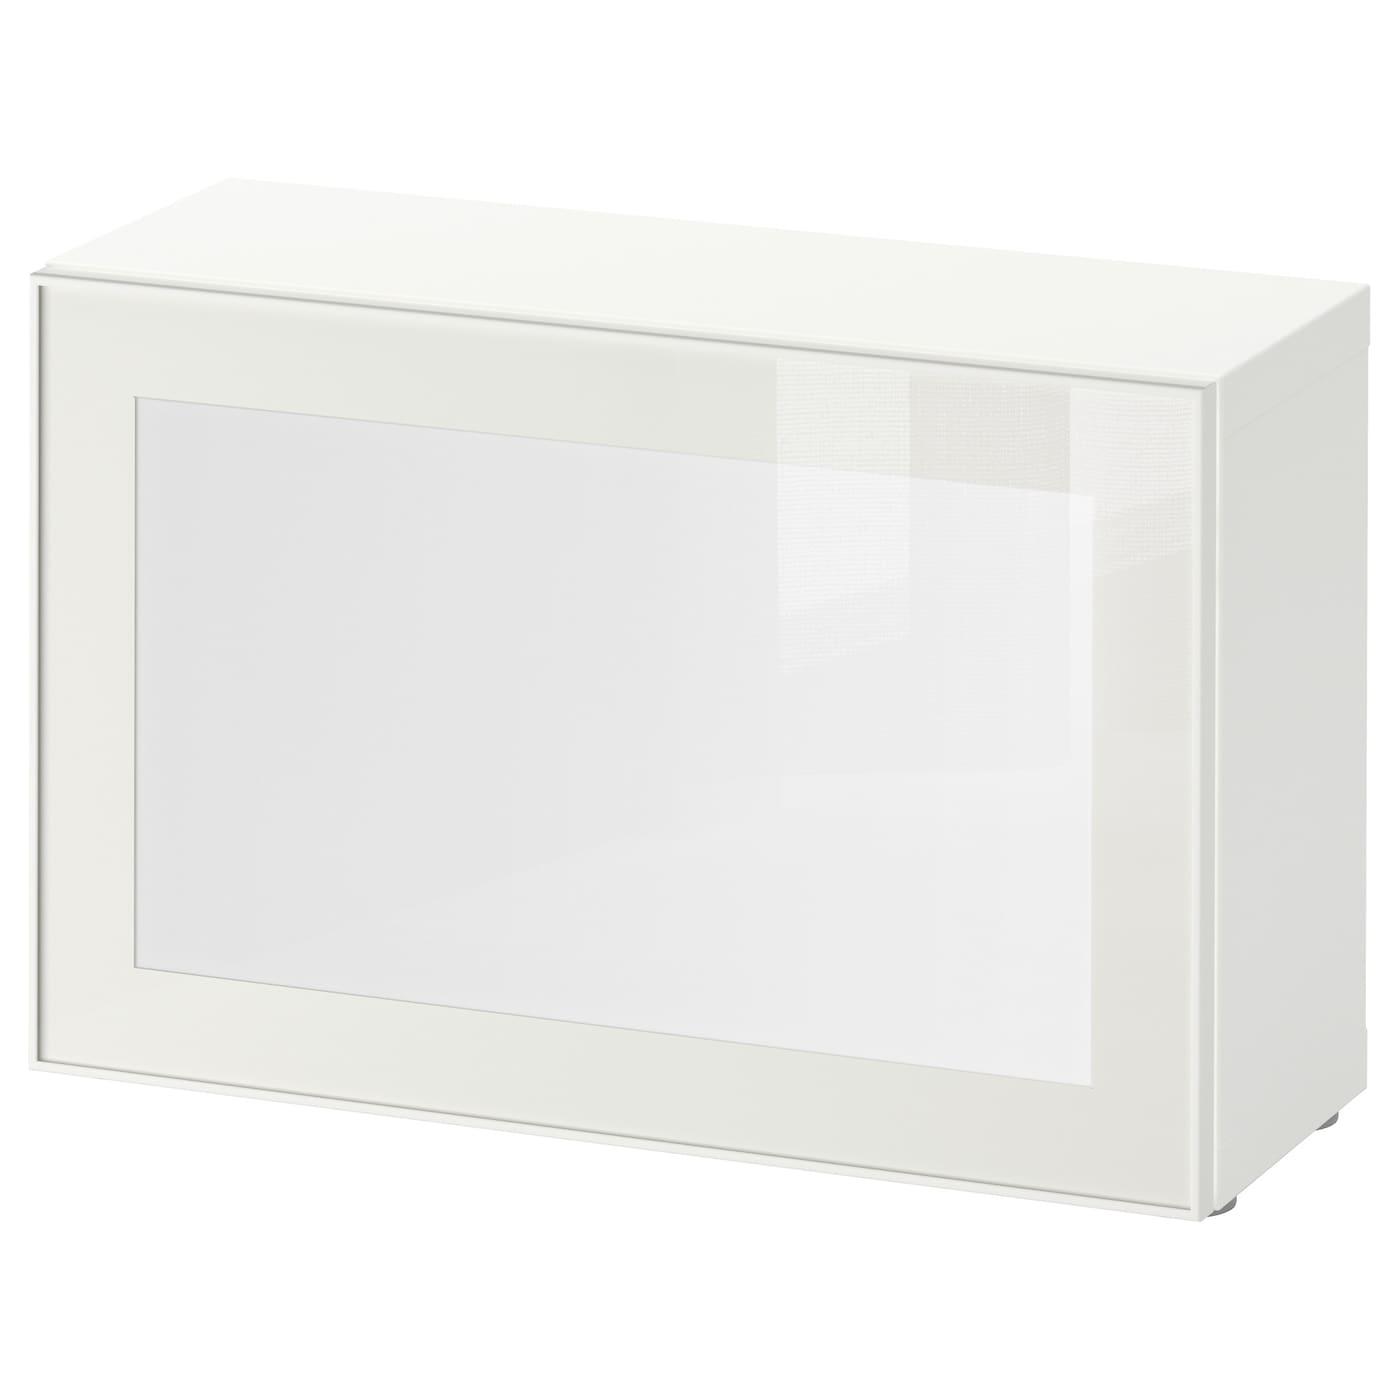 surte best open kast met led lichtdeur wit wit 60 x 20 x 38 cm ikea. Black Bedroom Furniture Sets. Home Design Ideas